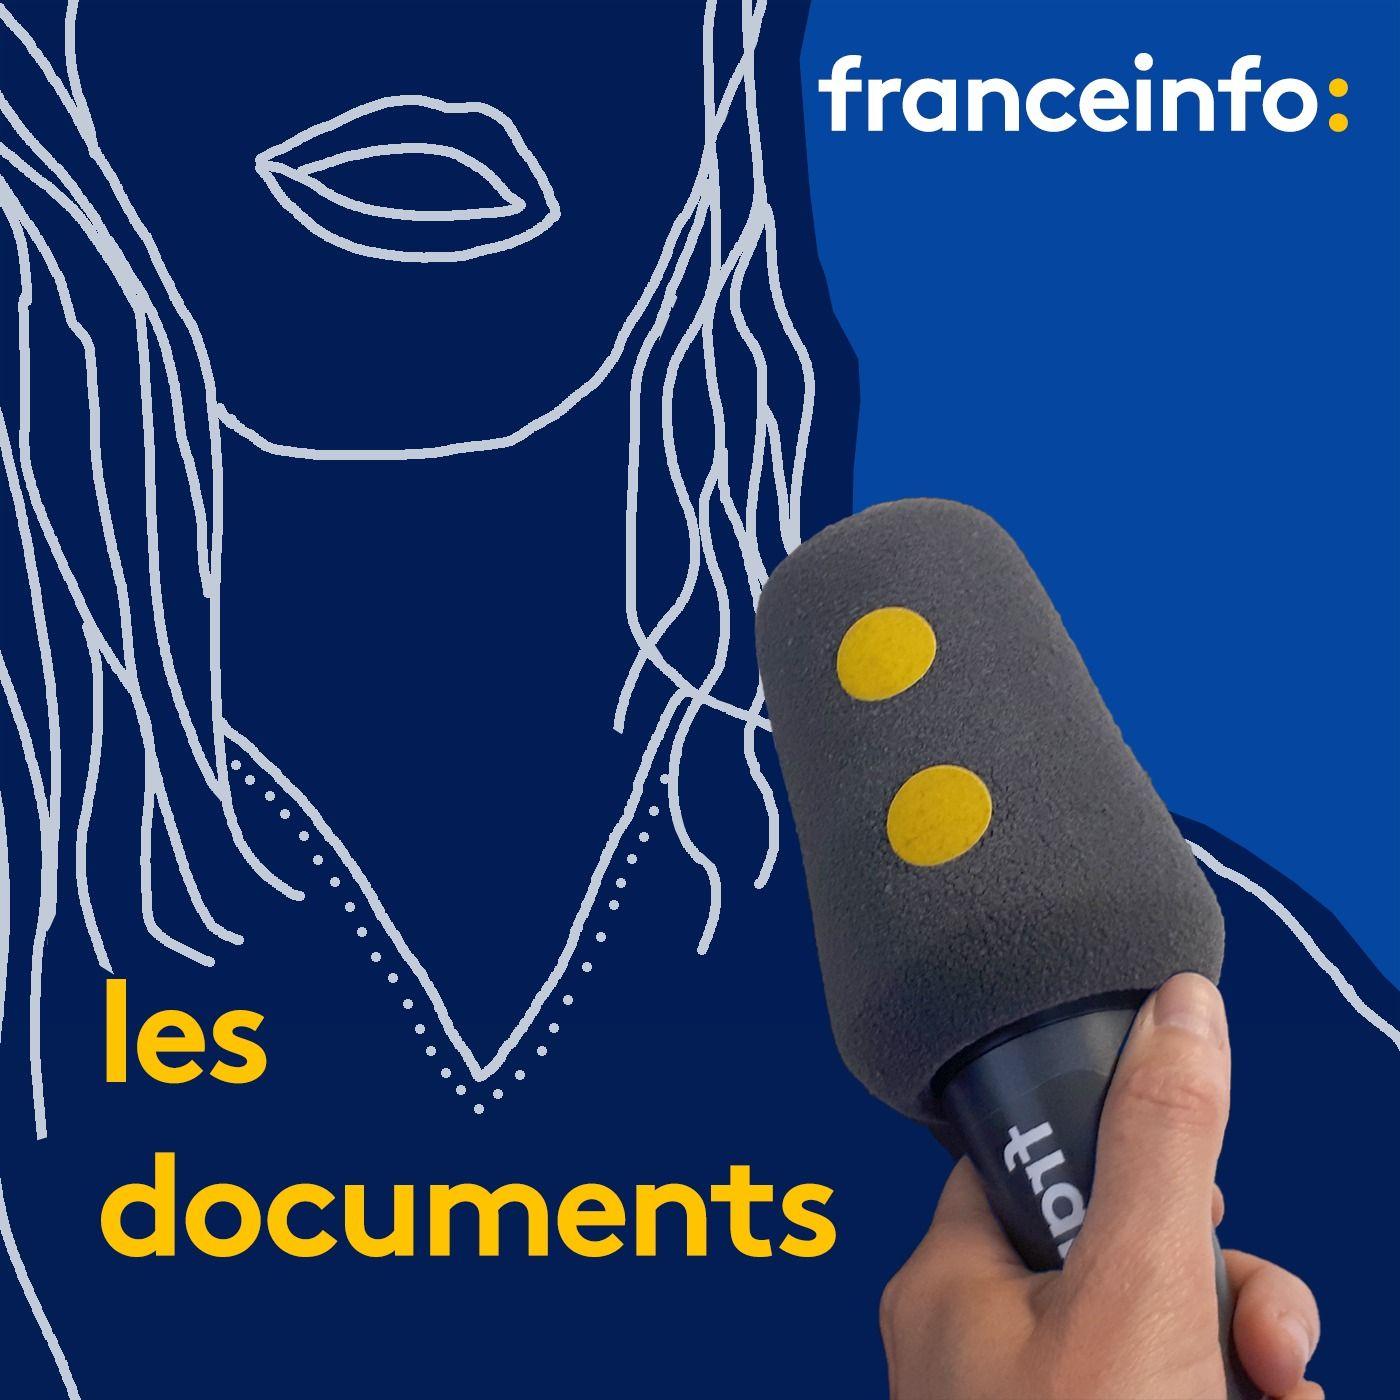 Les documents franceinfo::franceinfo